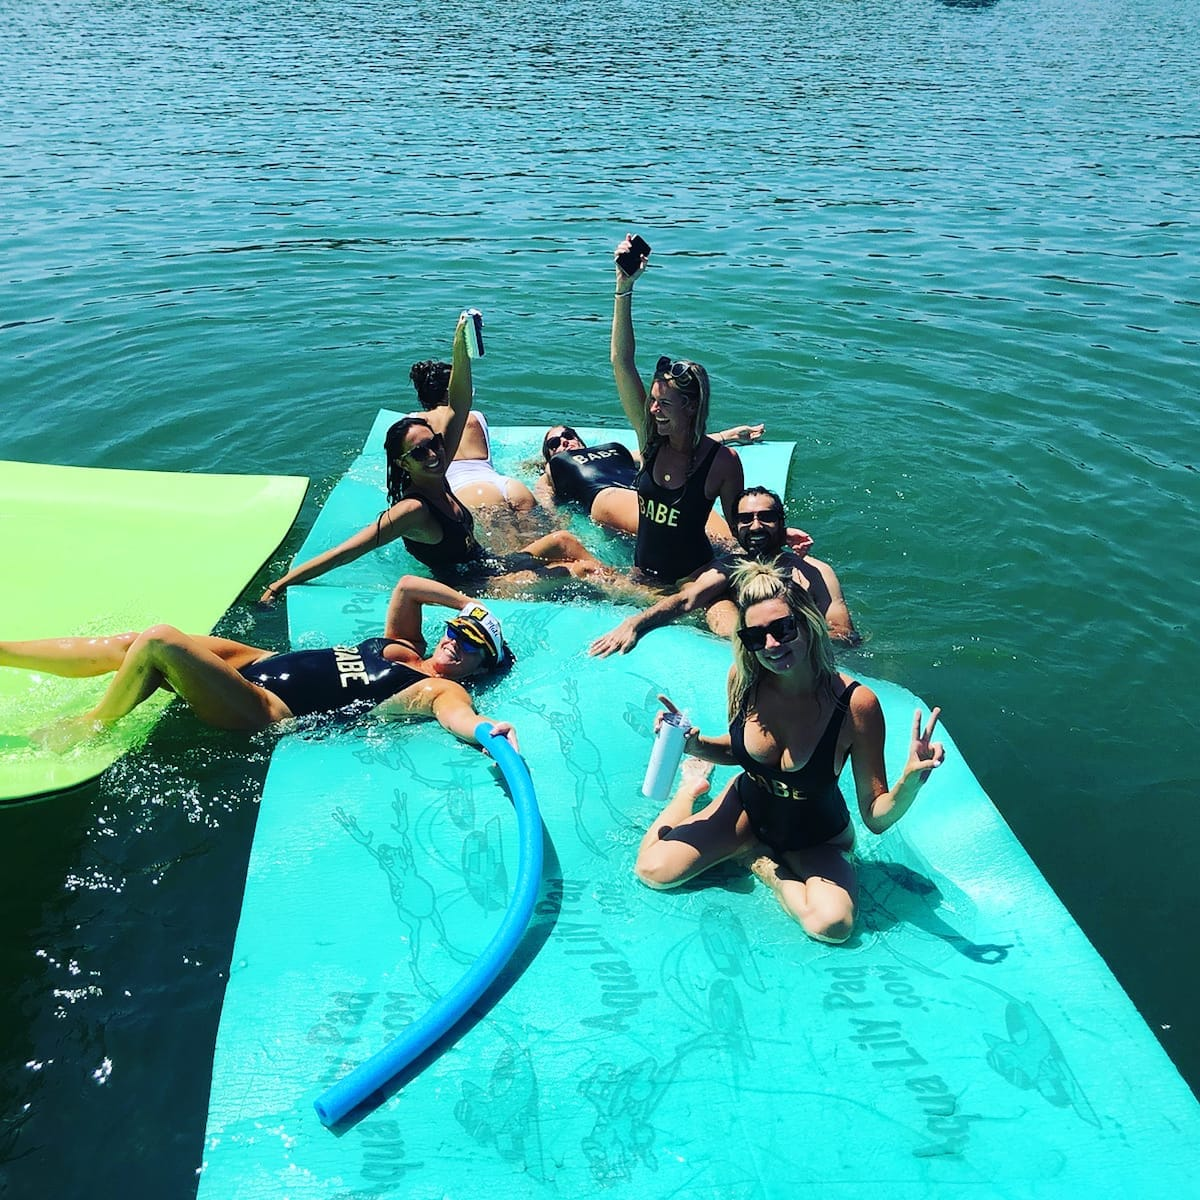 Island Pontoon Rentals - Lake Travis Pontoon Boat Rentals